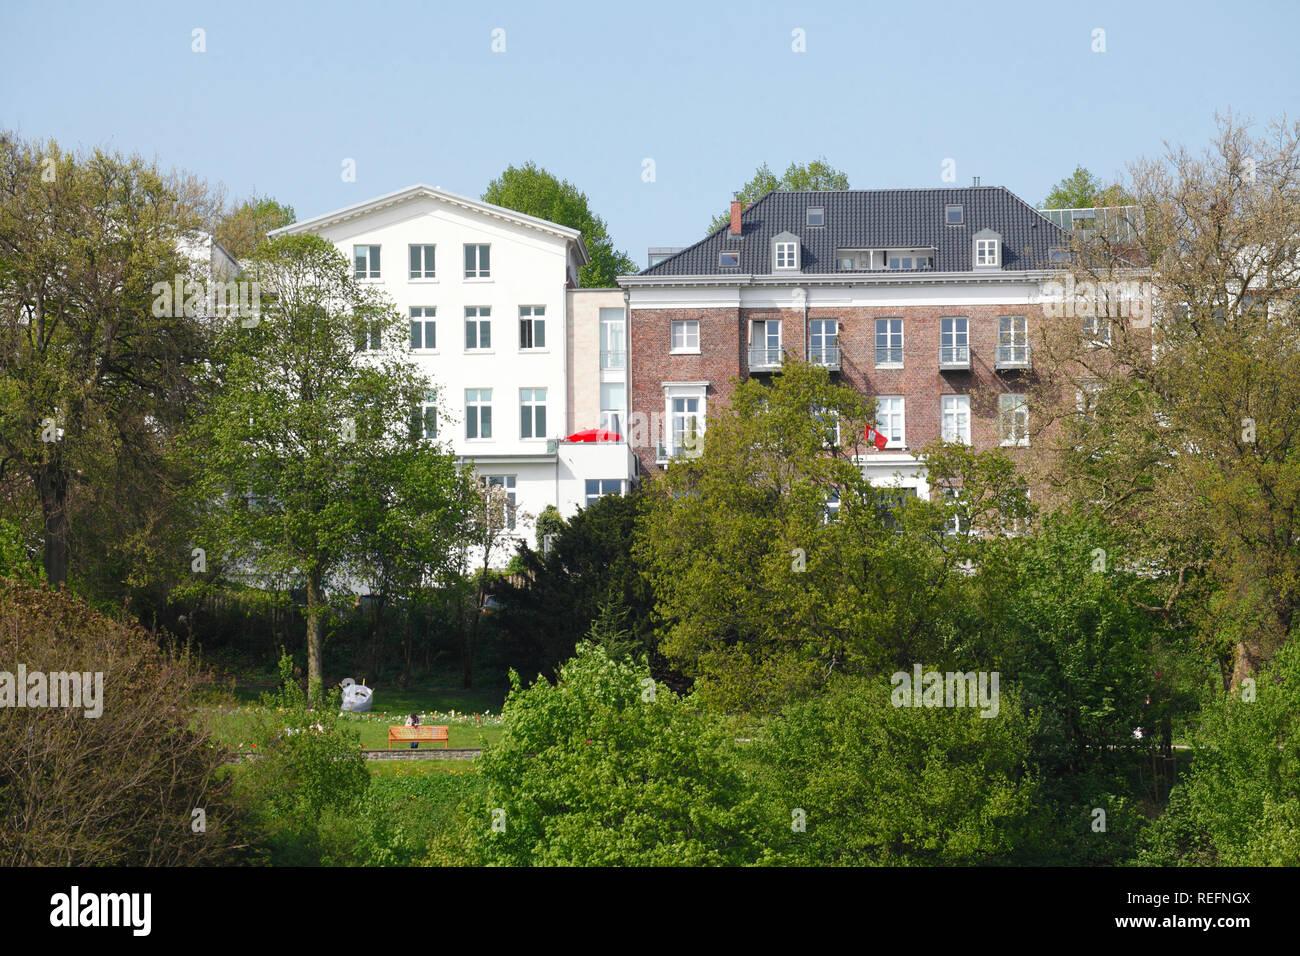 Residential building on the Elbe bank, Altona, Hamburg, Germany, Europe I Wohngebäude am Elbufer, Altona,  Hamburg, Deutschland, Europa I Stock Photo